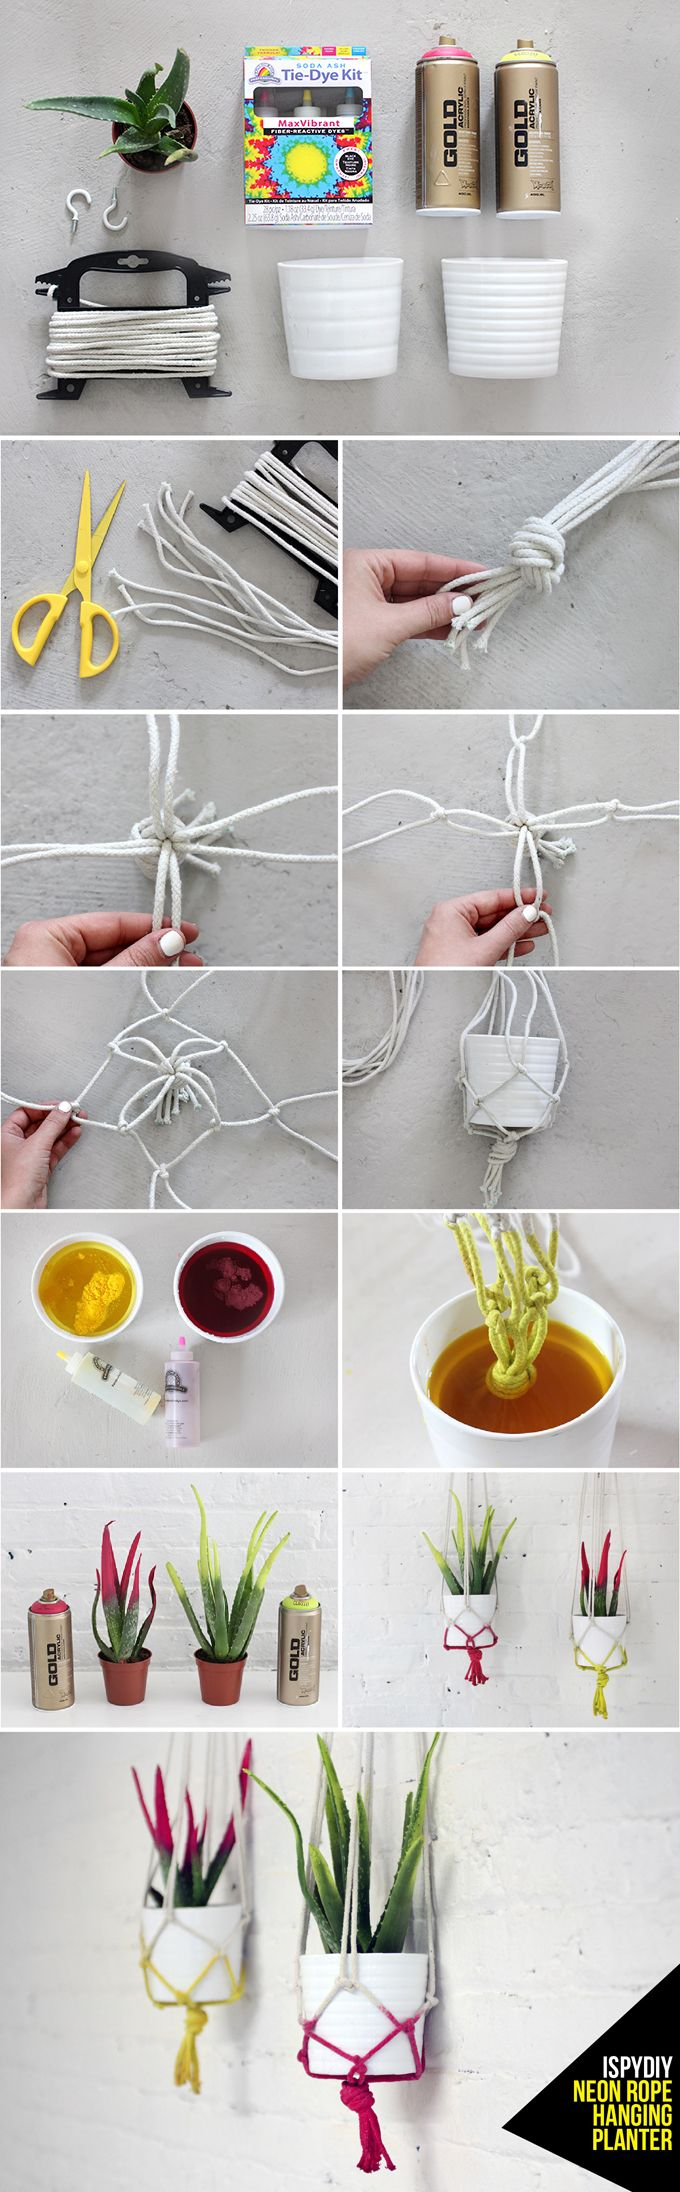 DIY rope hanging planters.